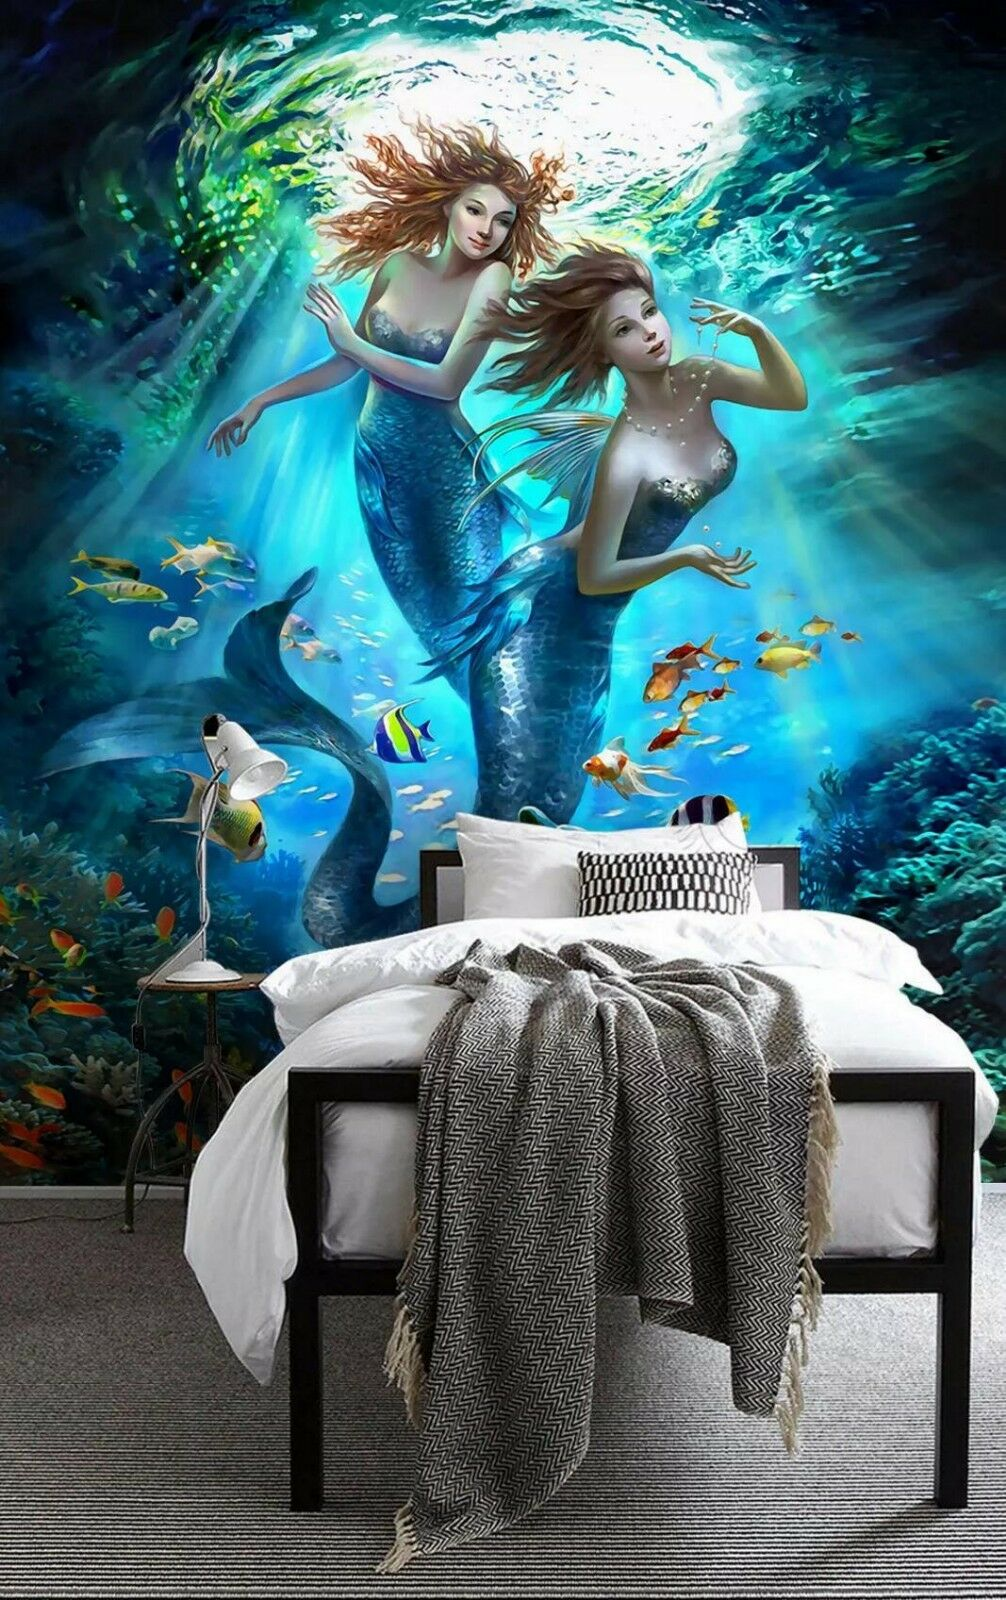 3D Mermaid Sea 822 Wall Paper Exclusive MXY Wallpaper Mural Decal Indoor Wall AJ